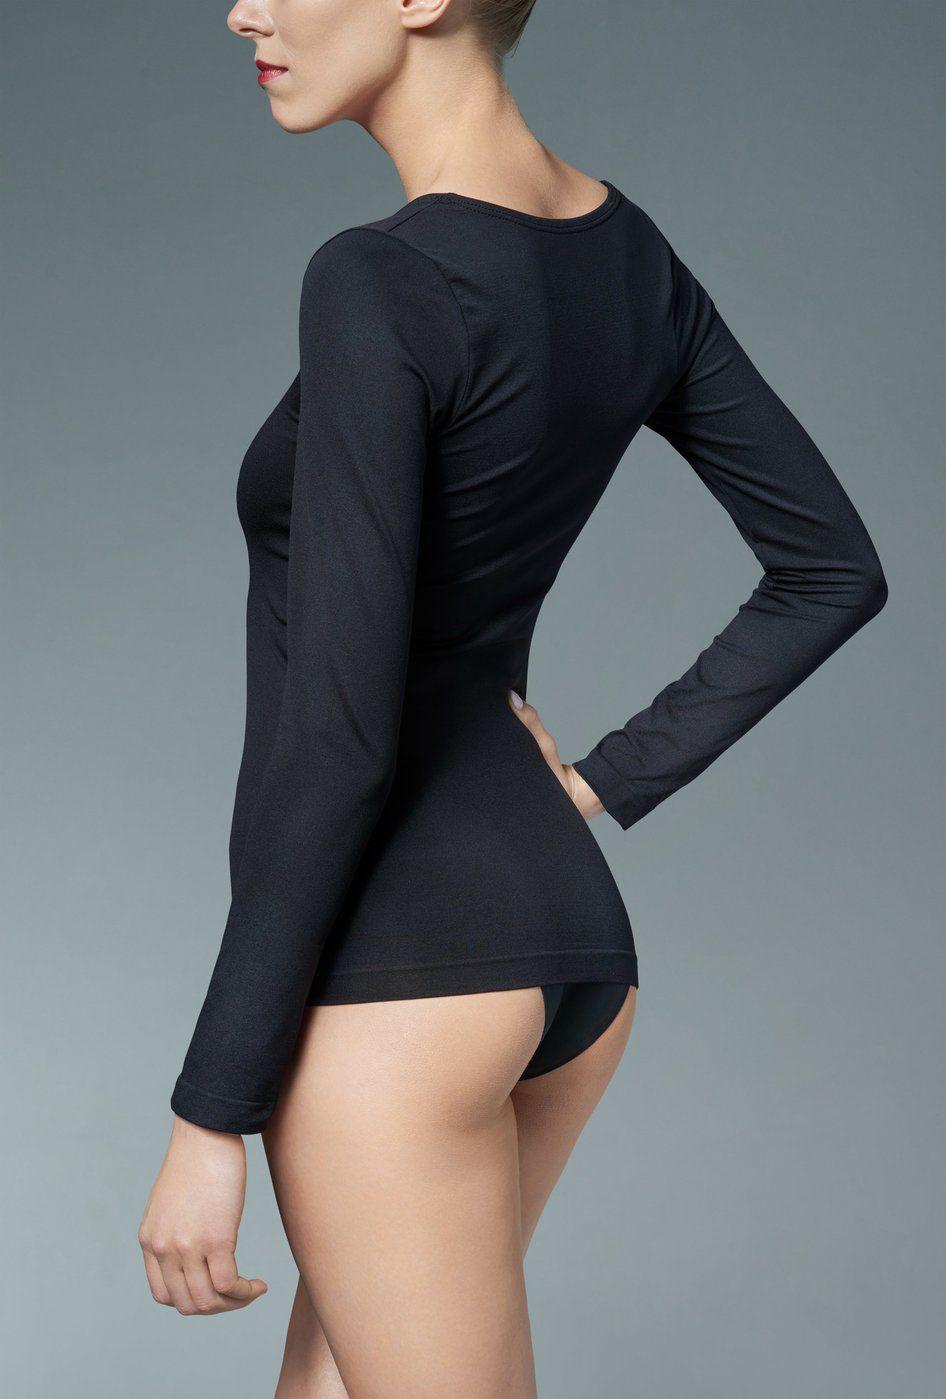 GATTA Bluzka - T-shirt L 5S FERRARI r. S (0042635S36787) 0042635S36787 Blūzes sievietēm